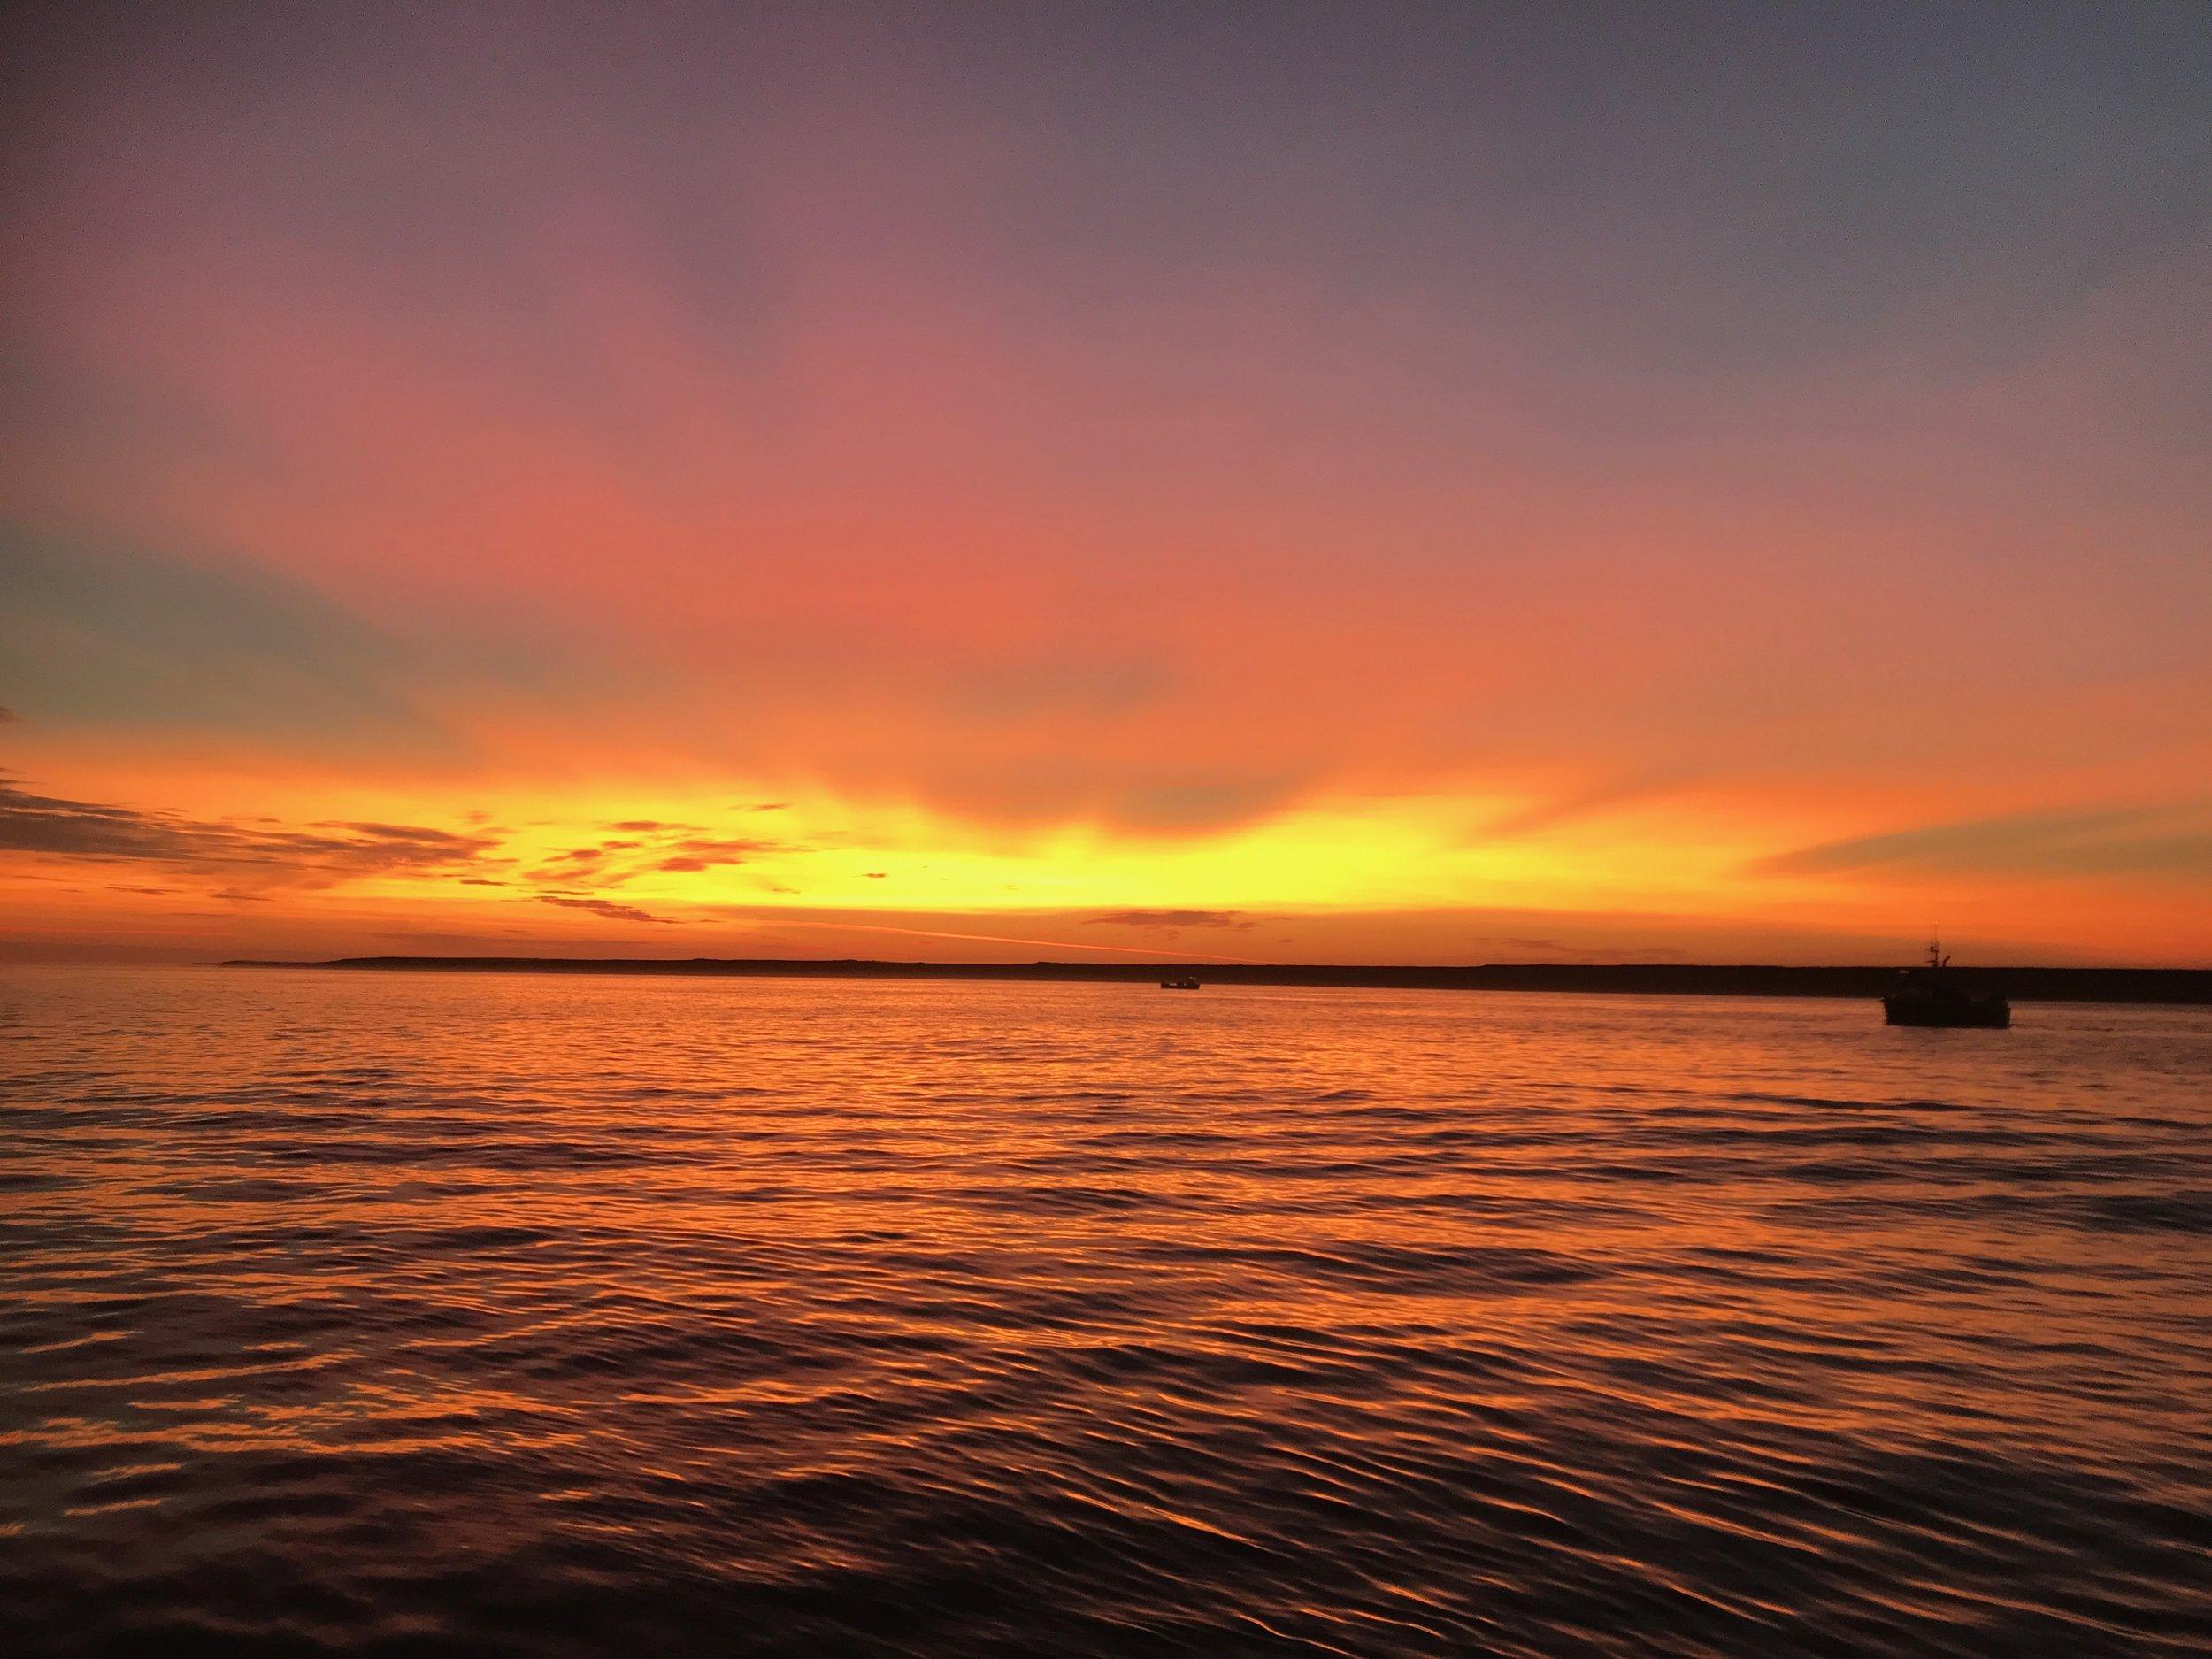 Sunset in Egegik, AK 2019